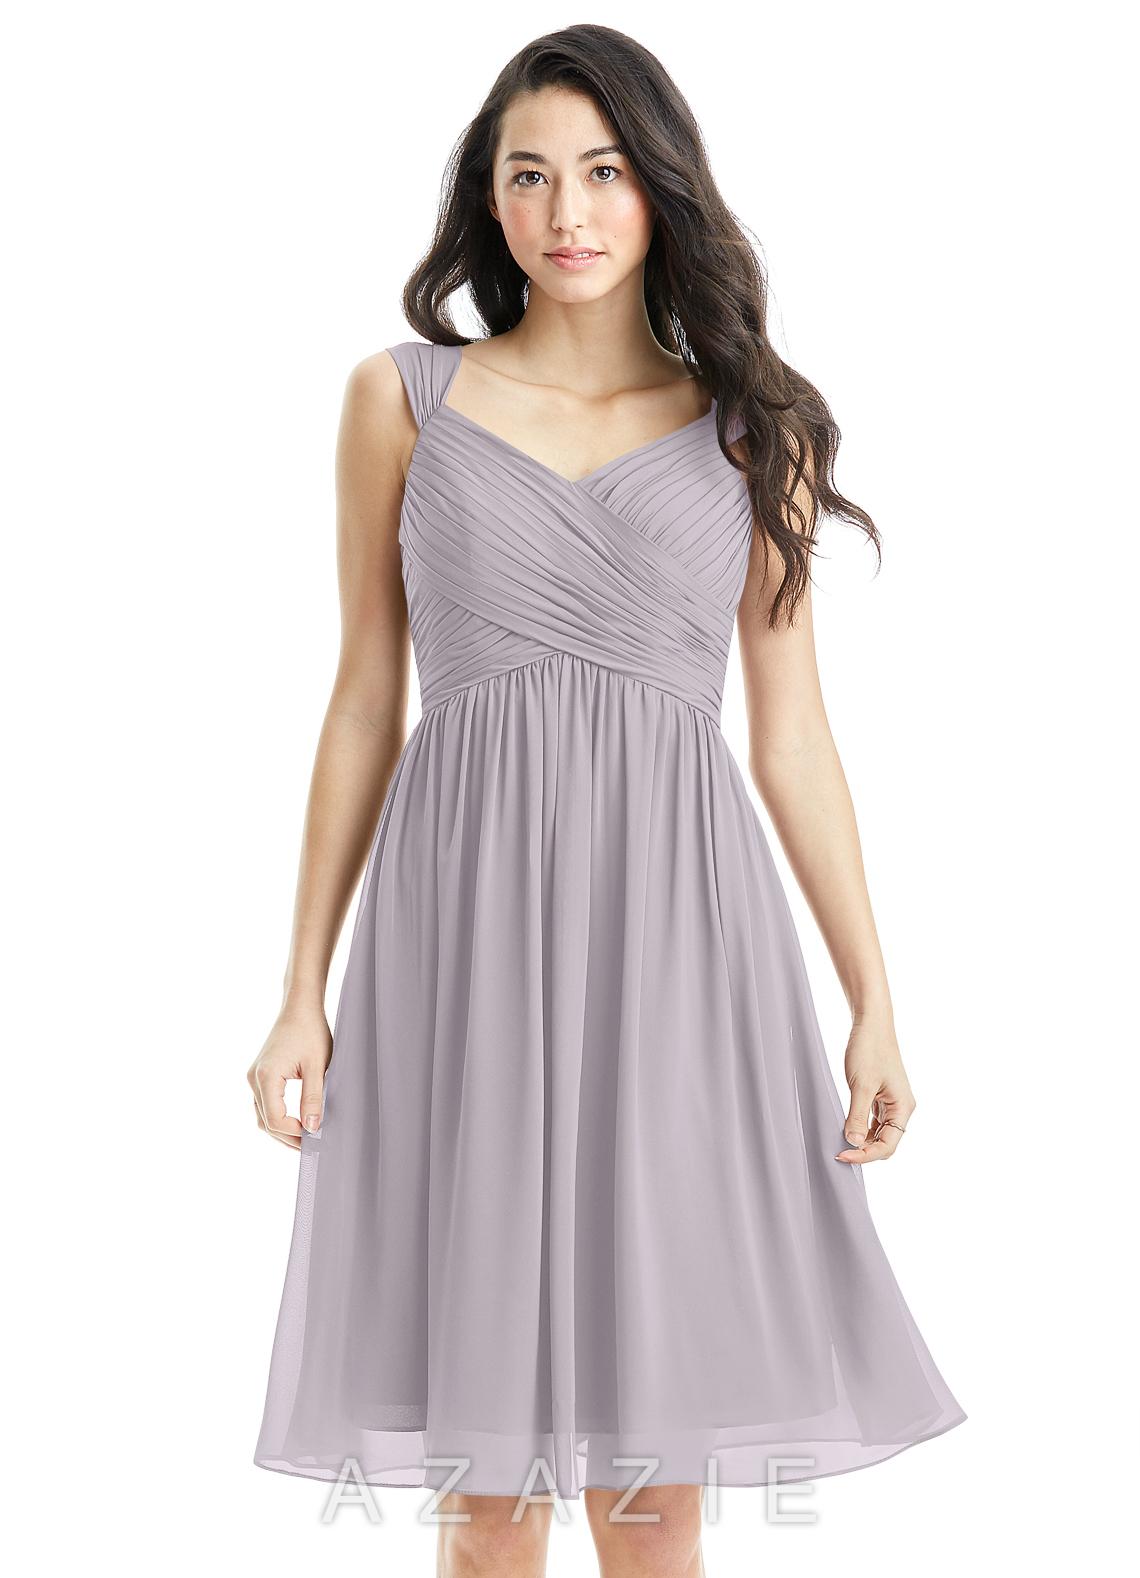 18ac879fde8 Azazie Angie Bridesmaid Dress